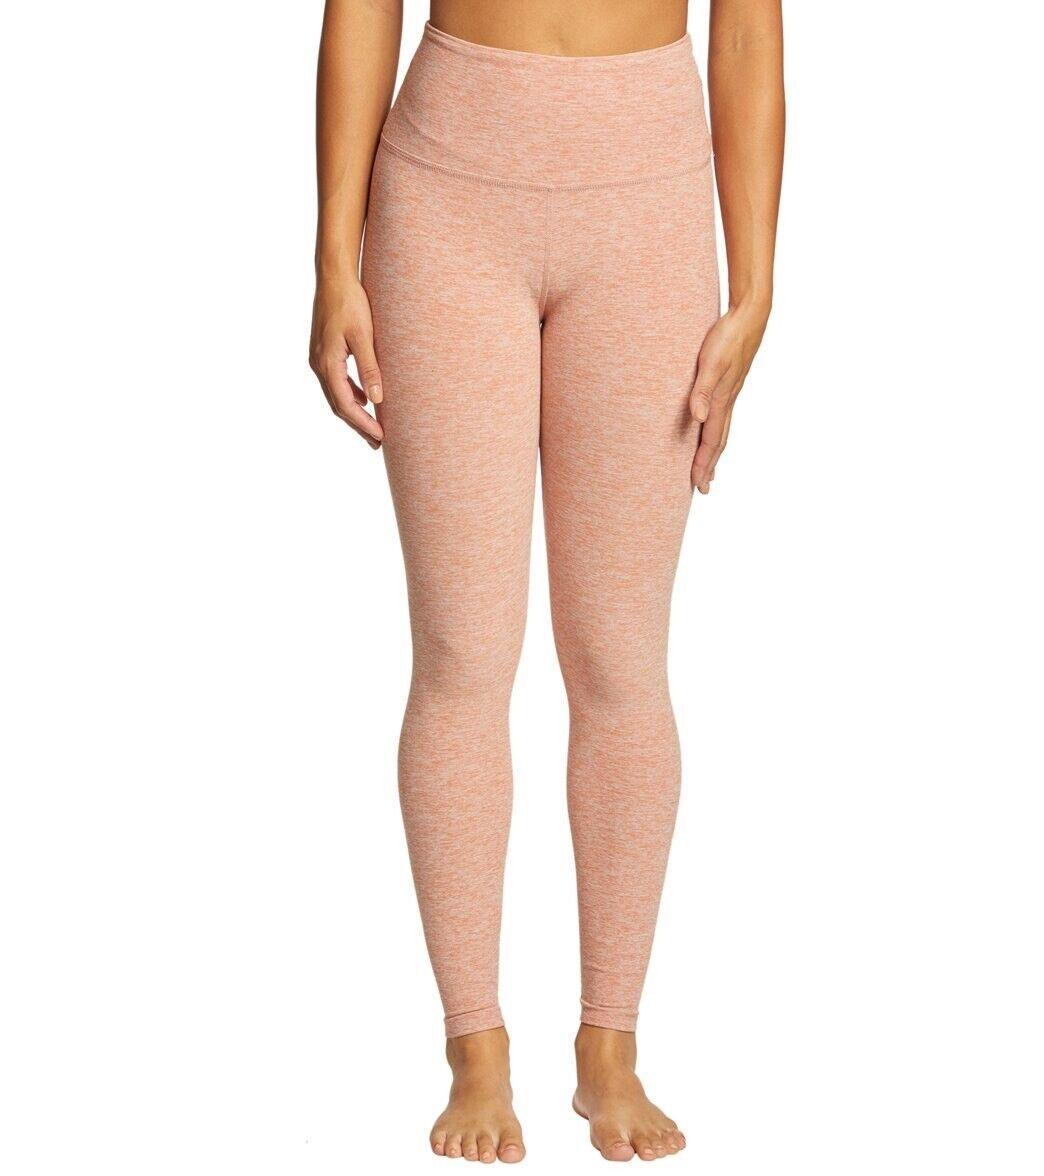 Beyond Yoga Take Me Higher Pink Rainwash spaceye legging NWT L